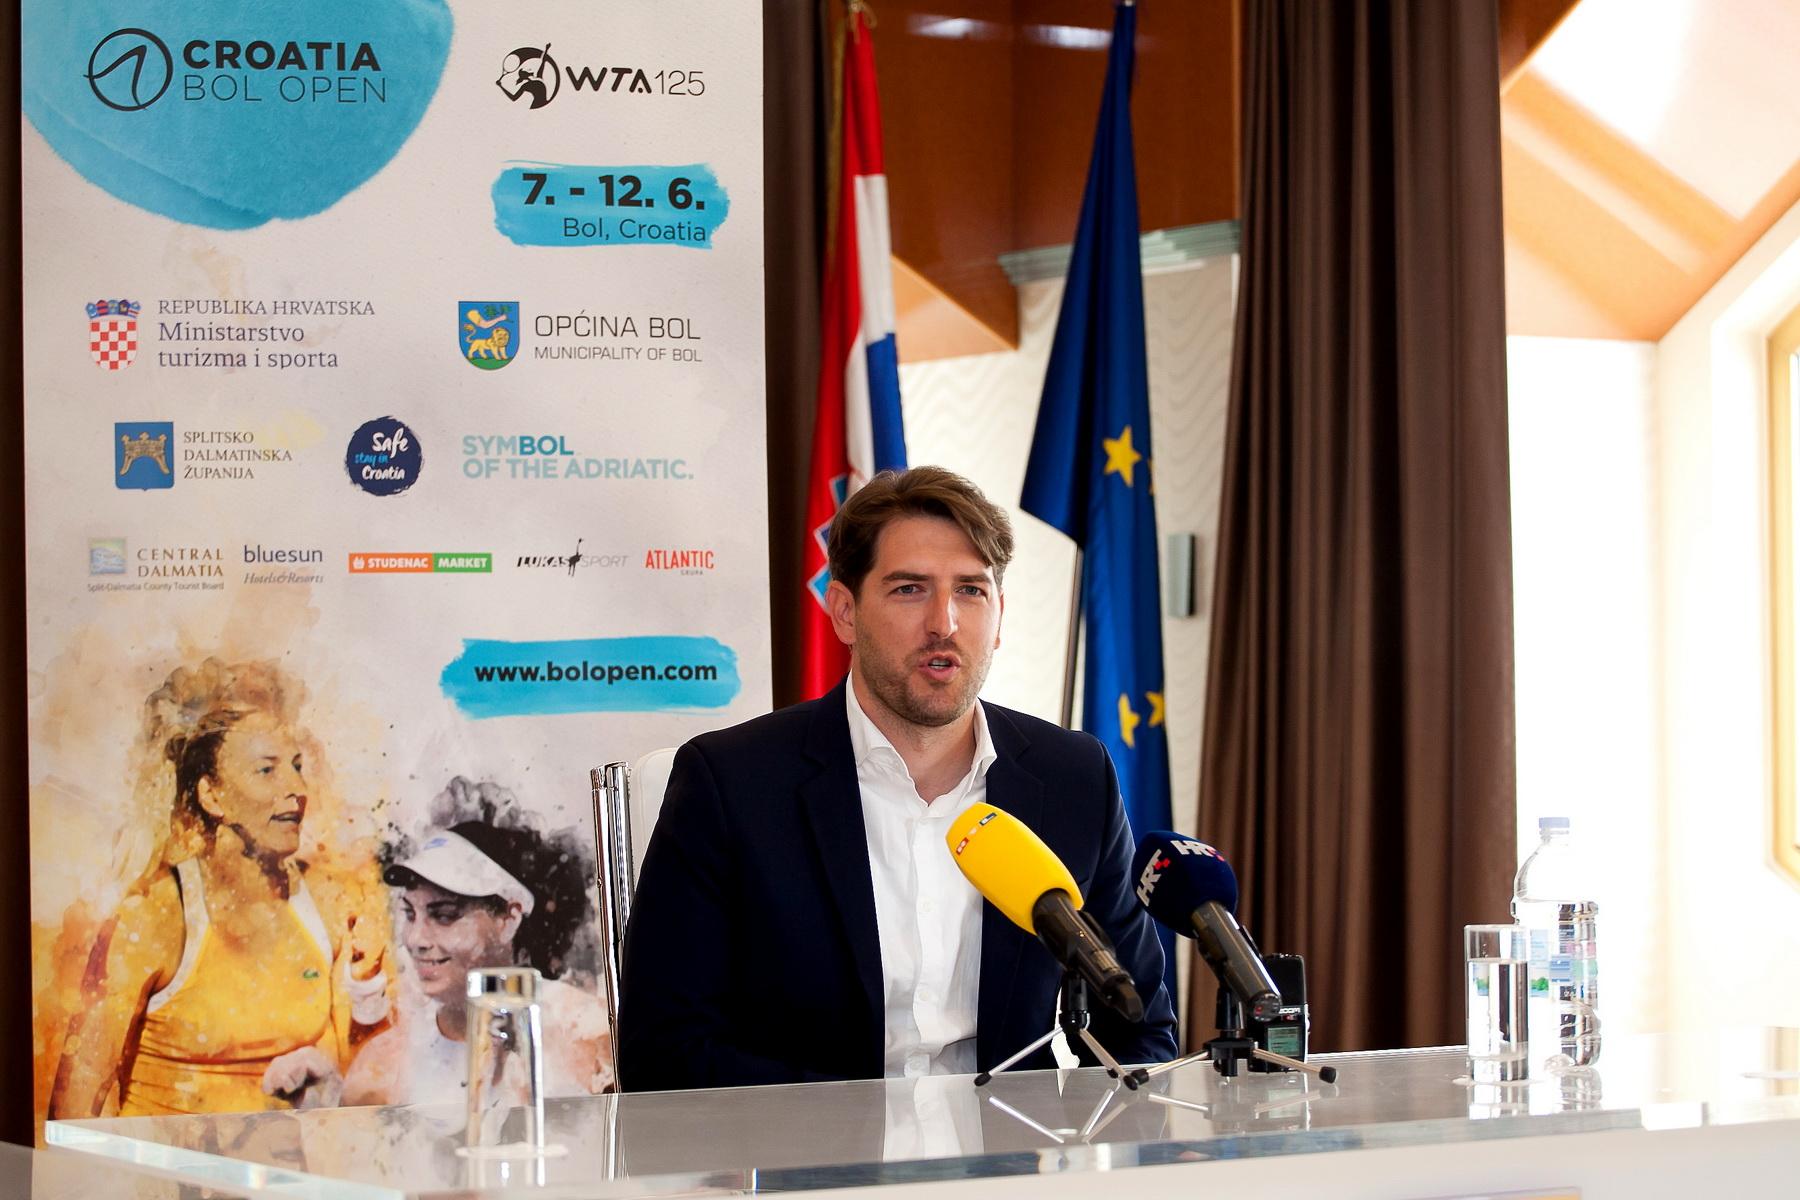 15th WTA Croatia Bol Open line-up announced